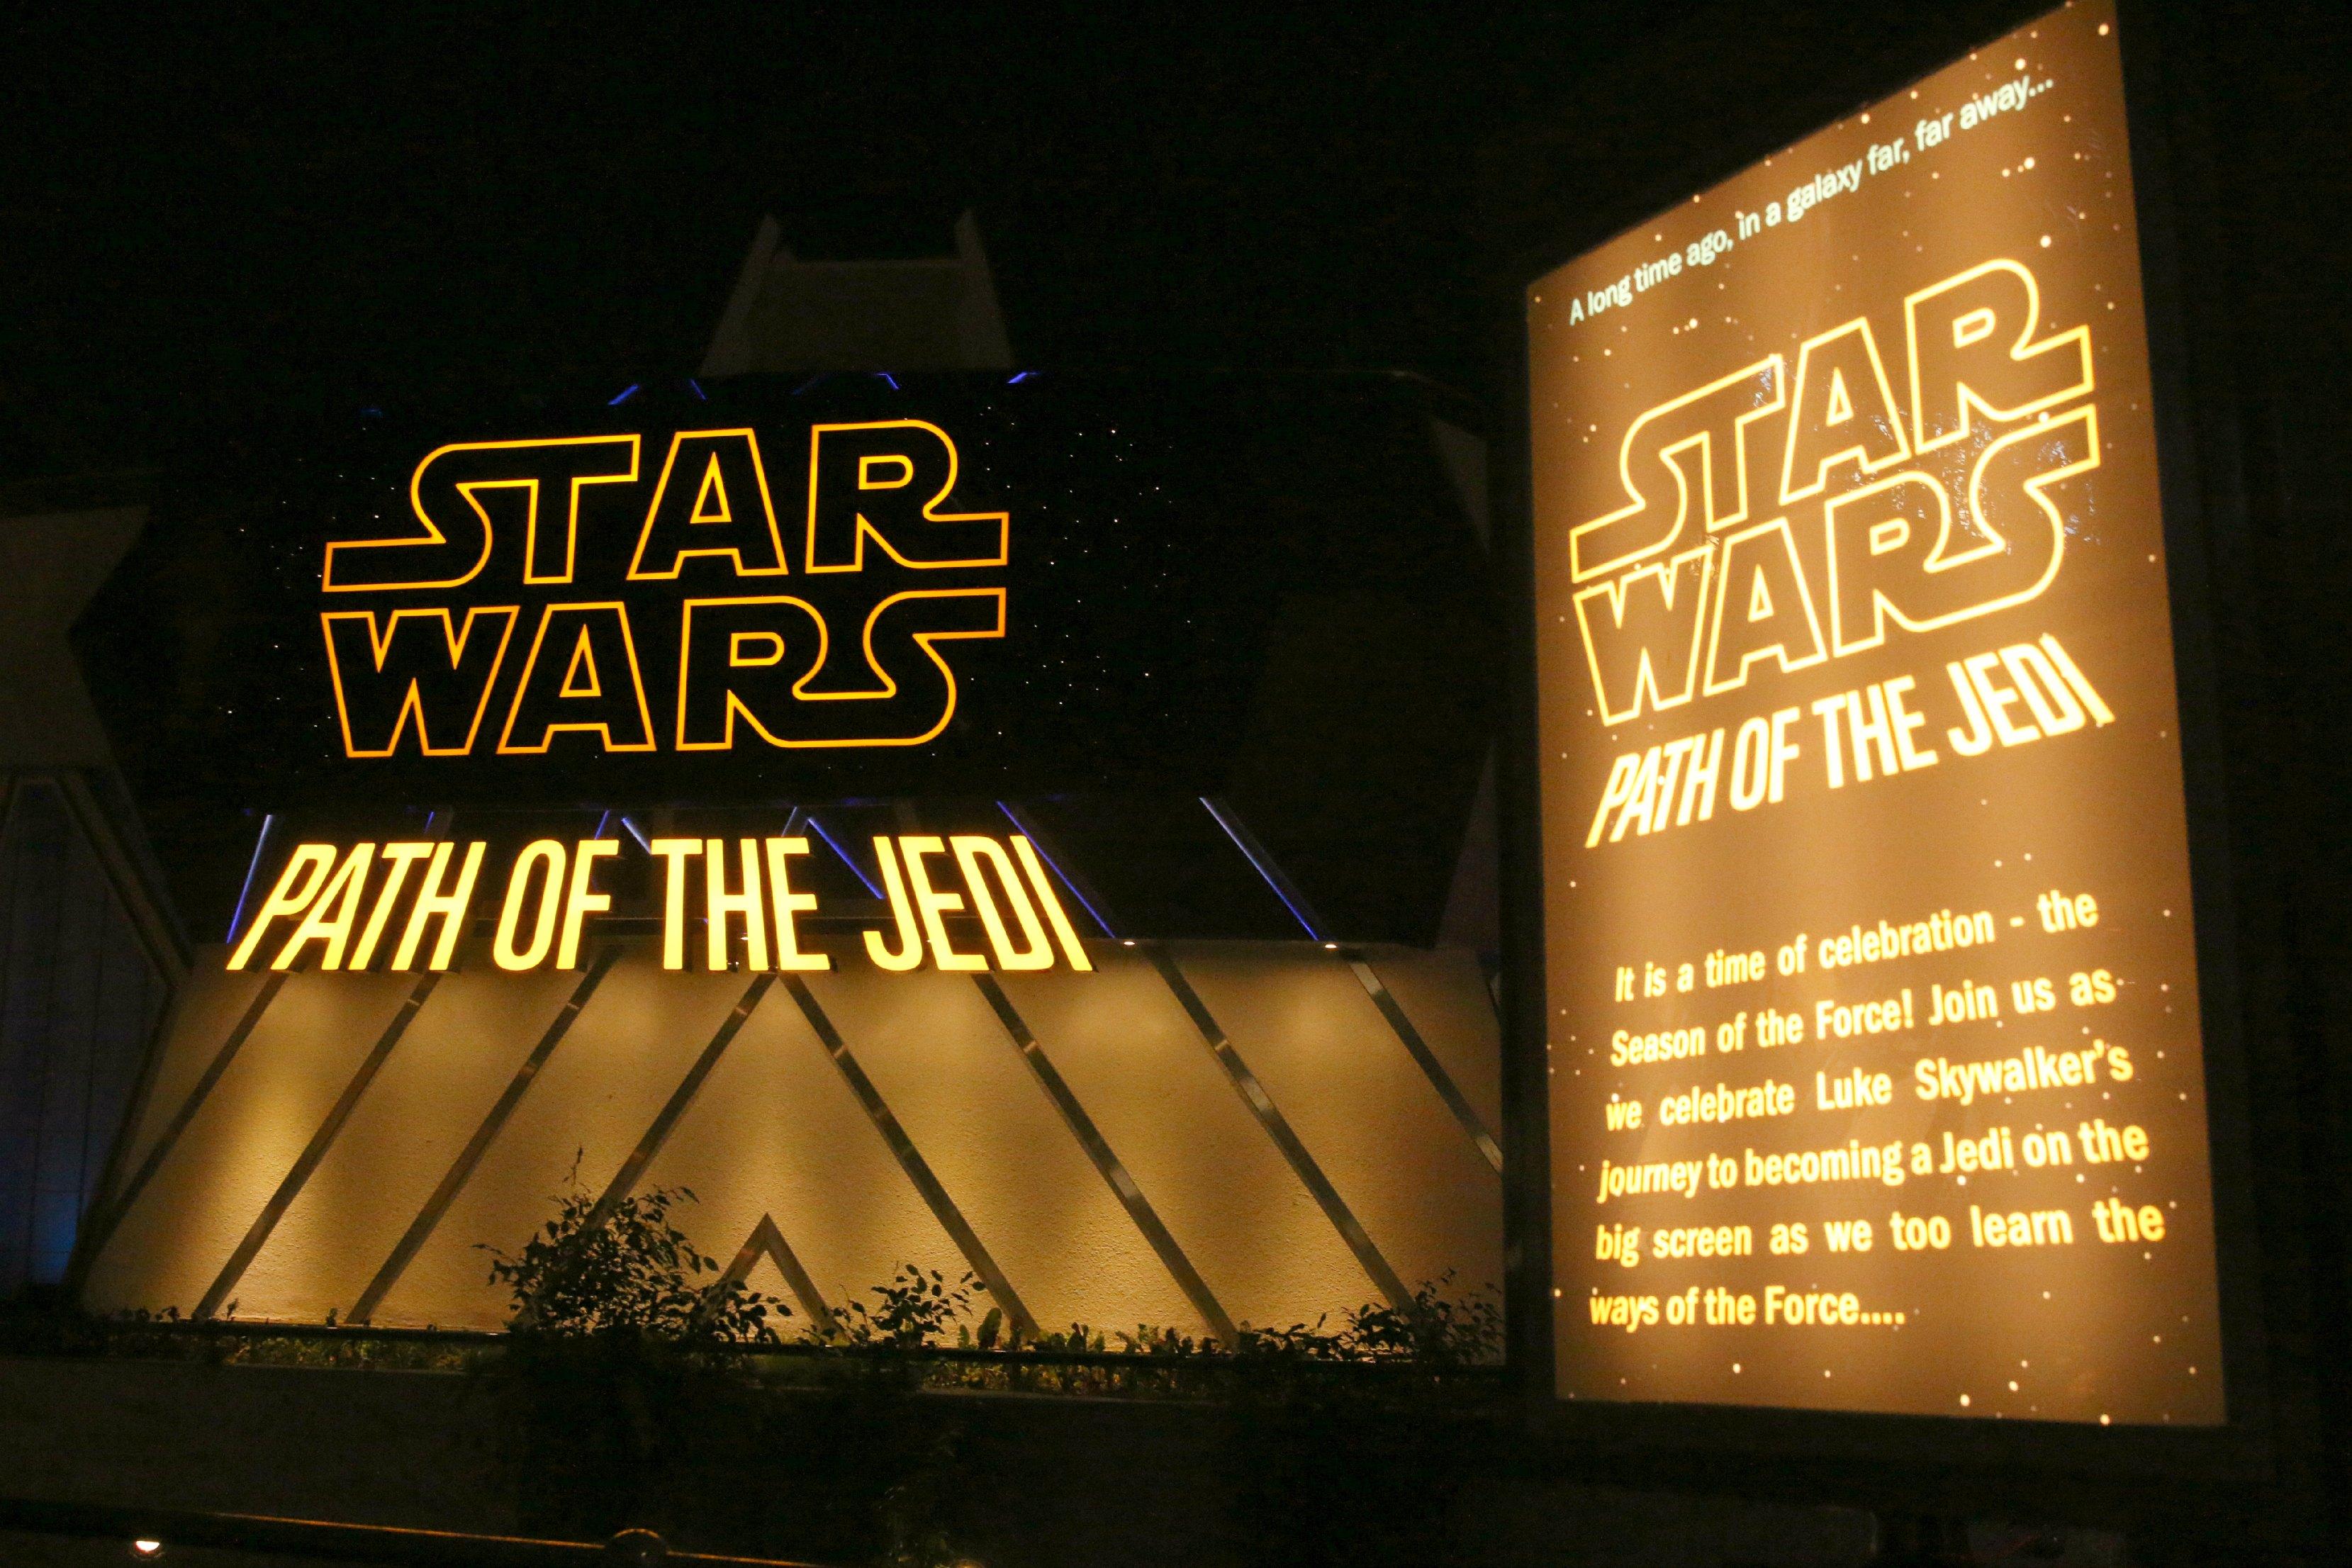 star wars path of the jedi guide